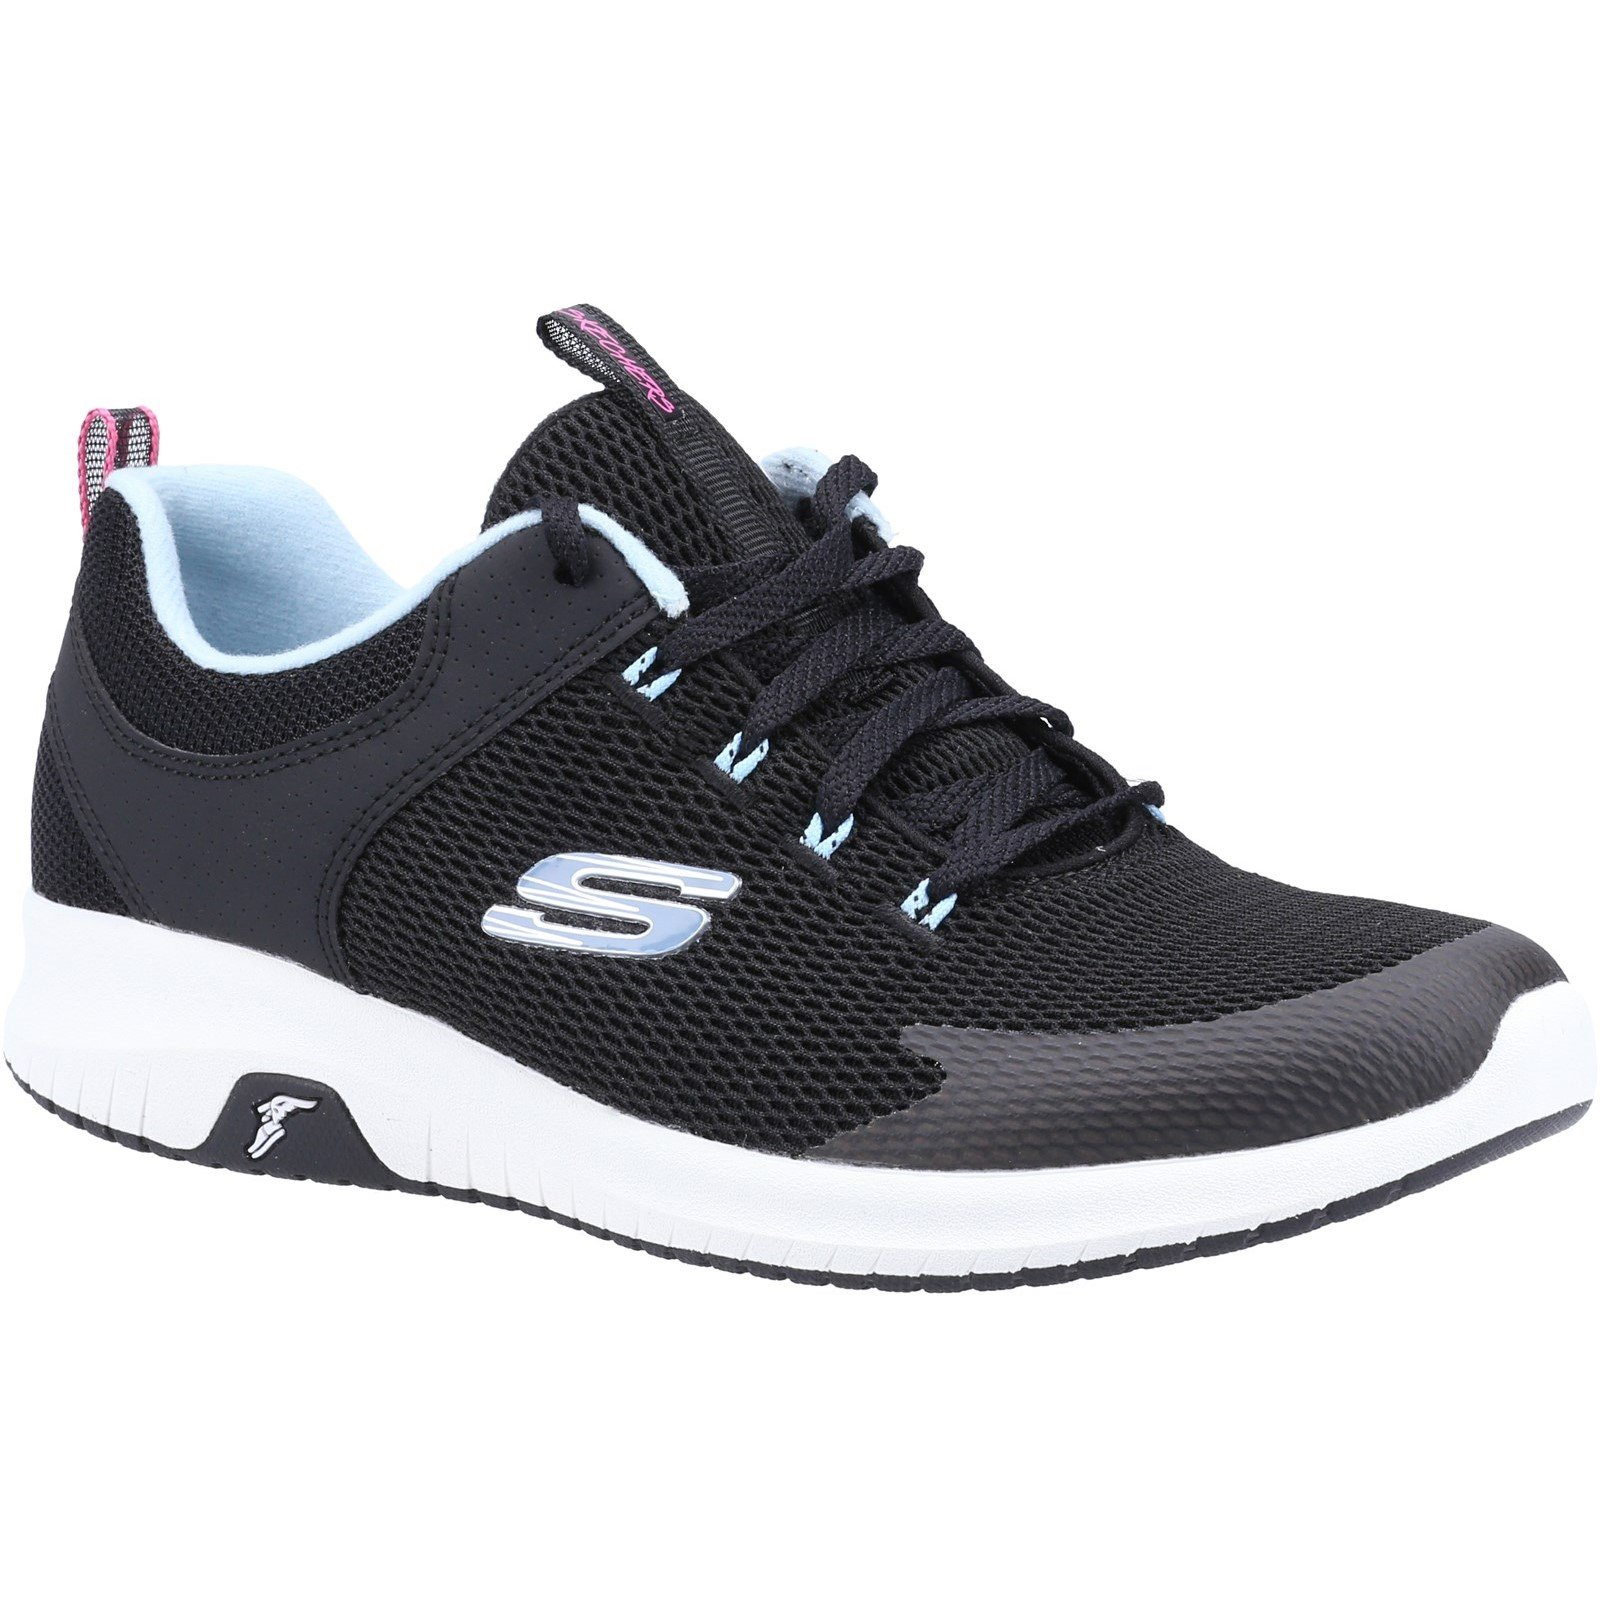 Skechers Women's Ultra Flex Prime Step Out Trainer Multicolor 32112 - Black/Light Blue 5